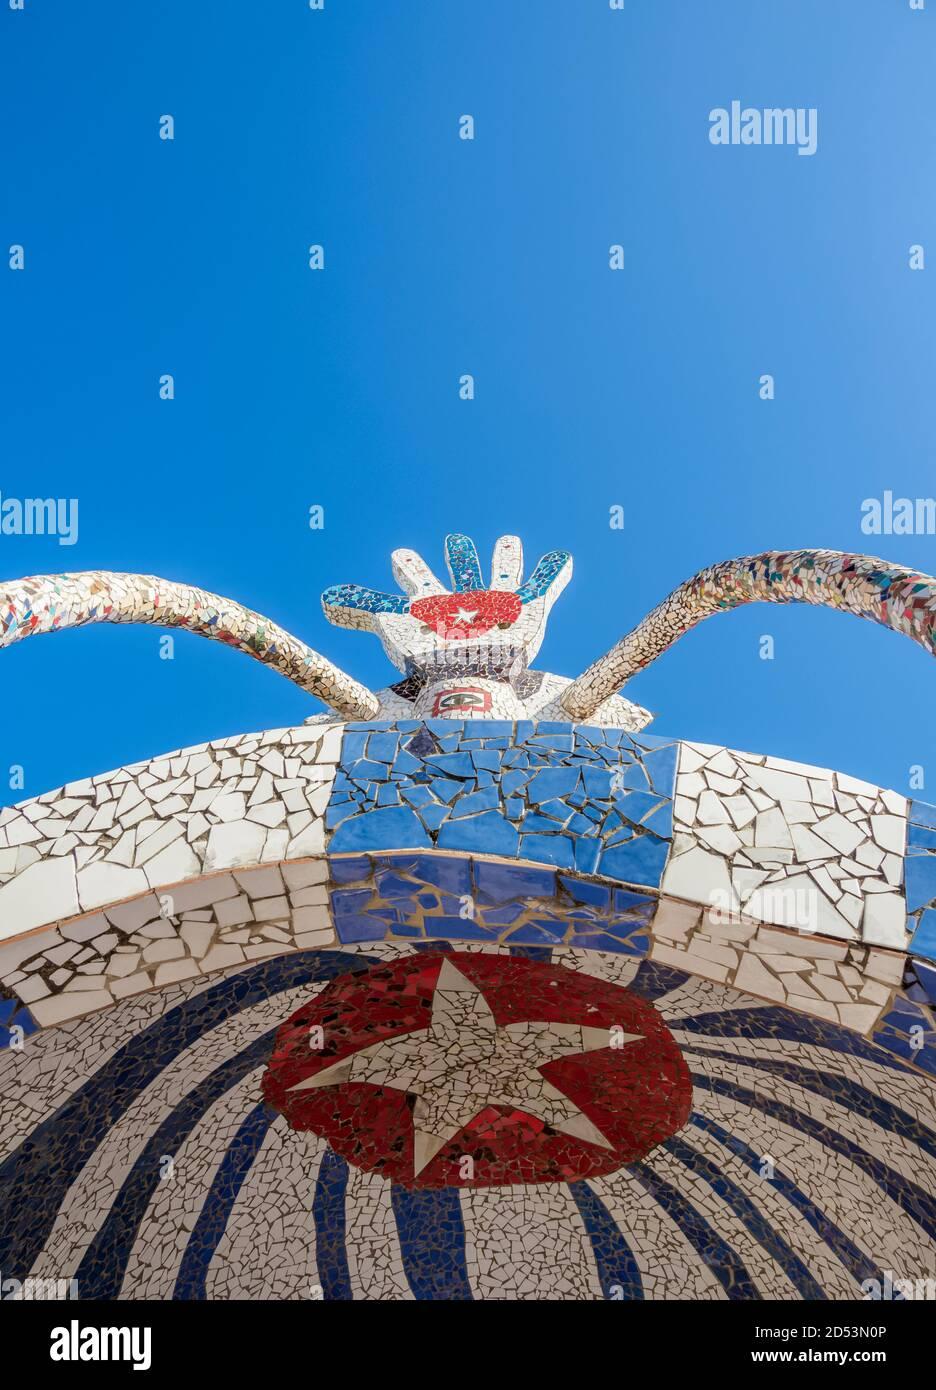 House of Fuster, detailed view, Fusterlandia, Jaimanitas Neighbourhood, Playa District, Havana, La Habana Province, Cuba Stock Photo